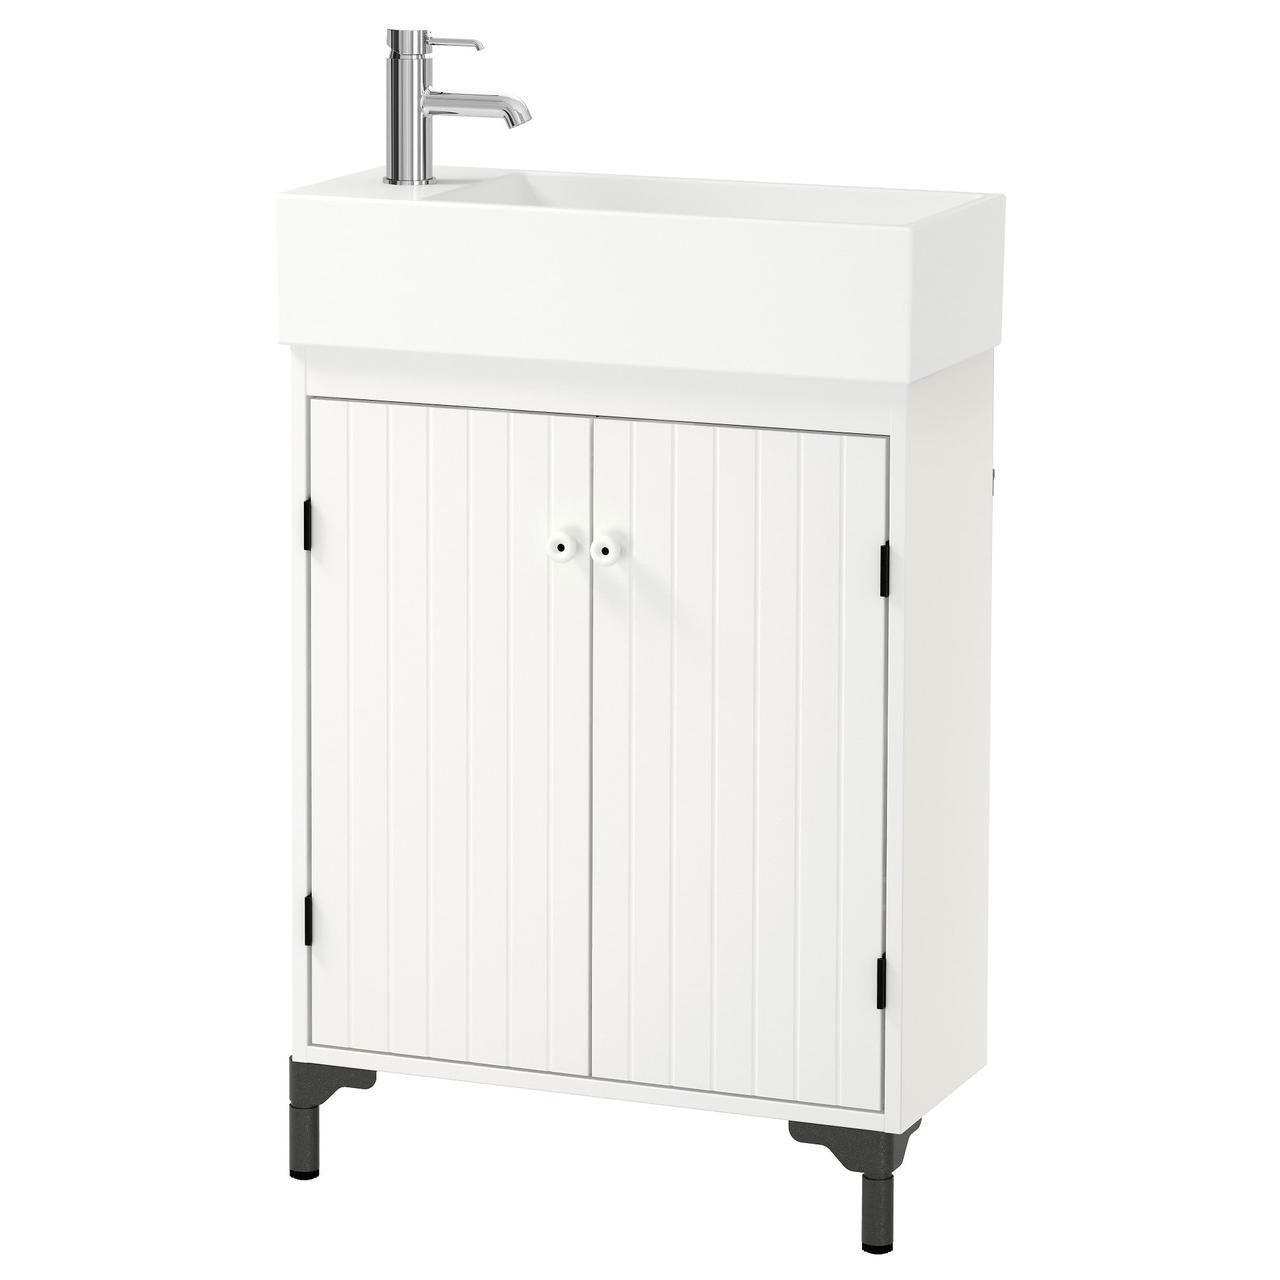 СИЛВЕРОН / ЛИЛЛОНГЕН Шкаф под раковину с 2 дврц, белый